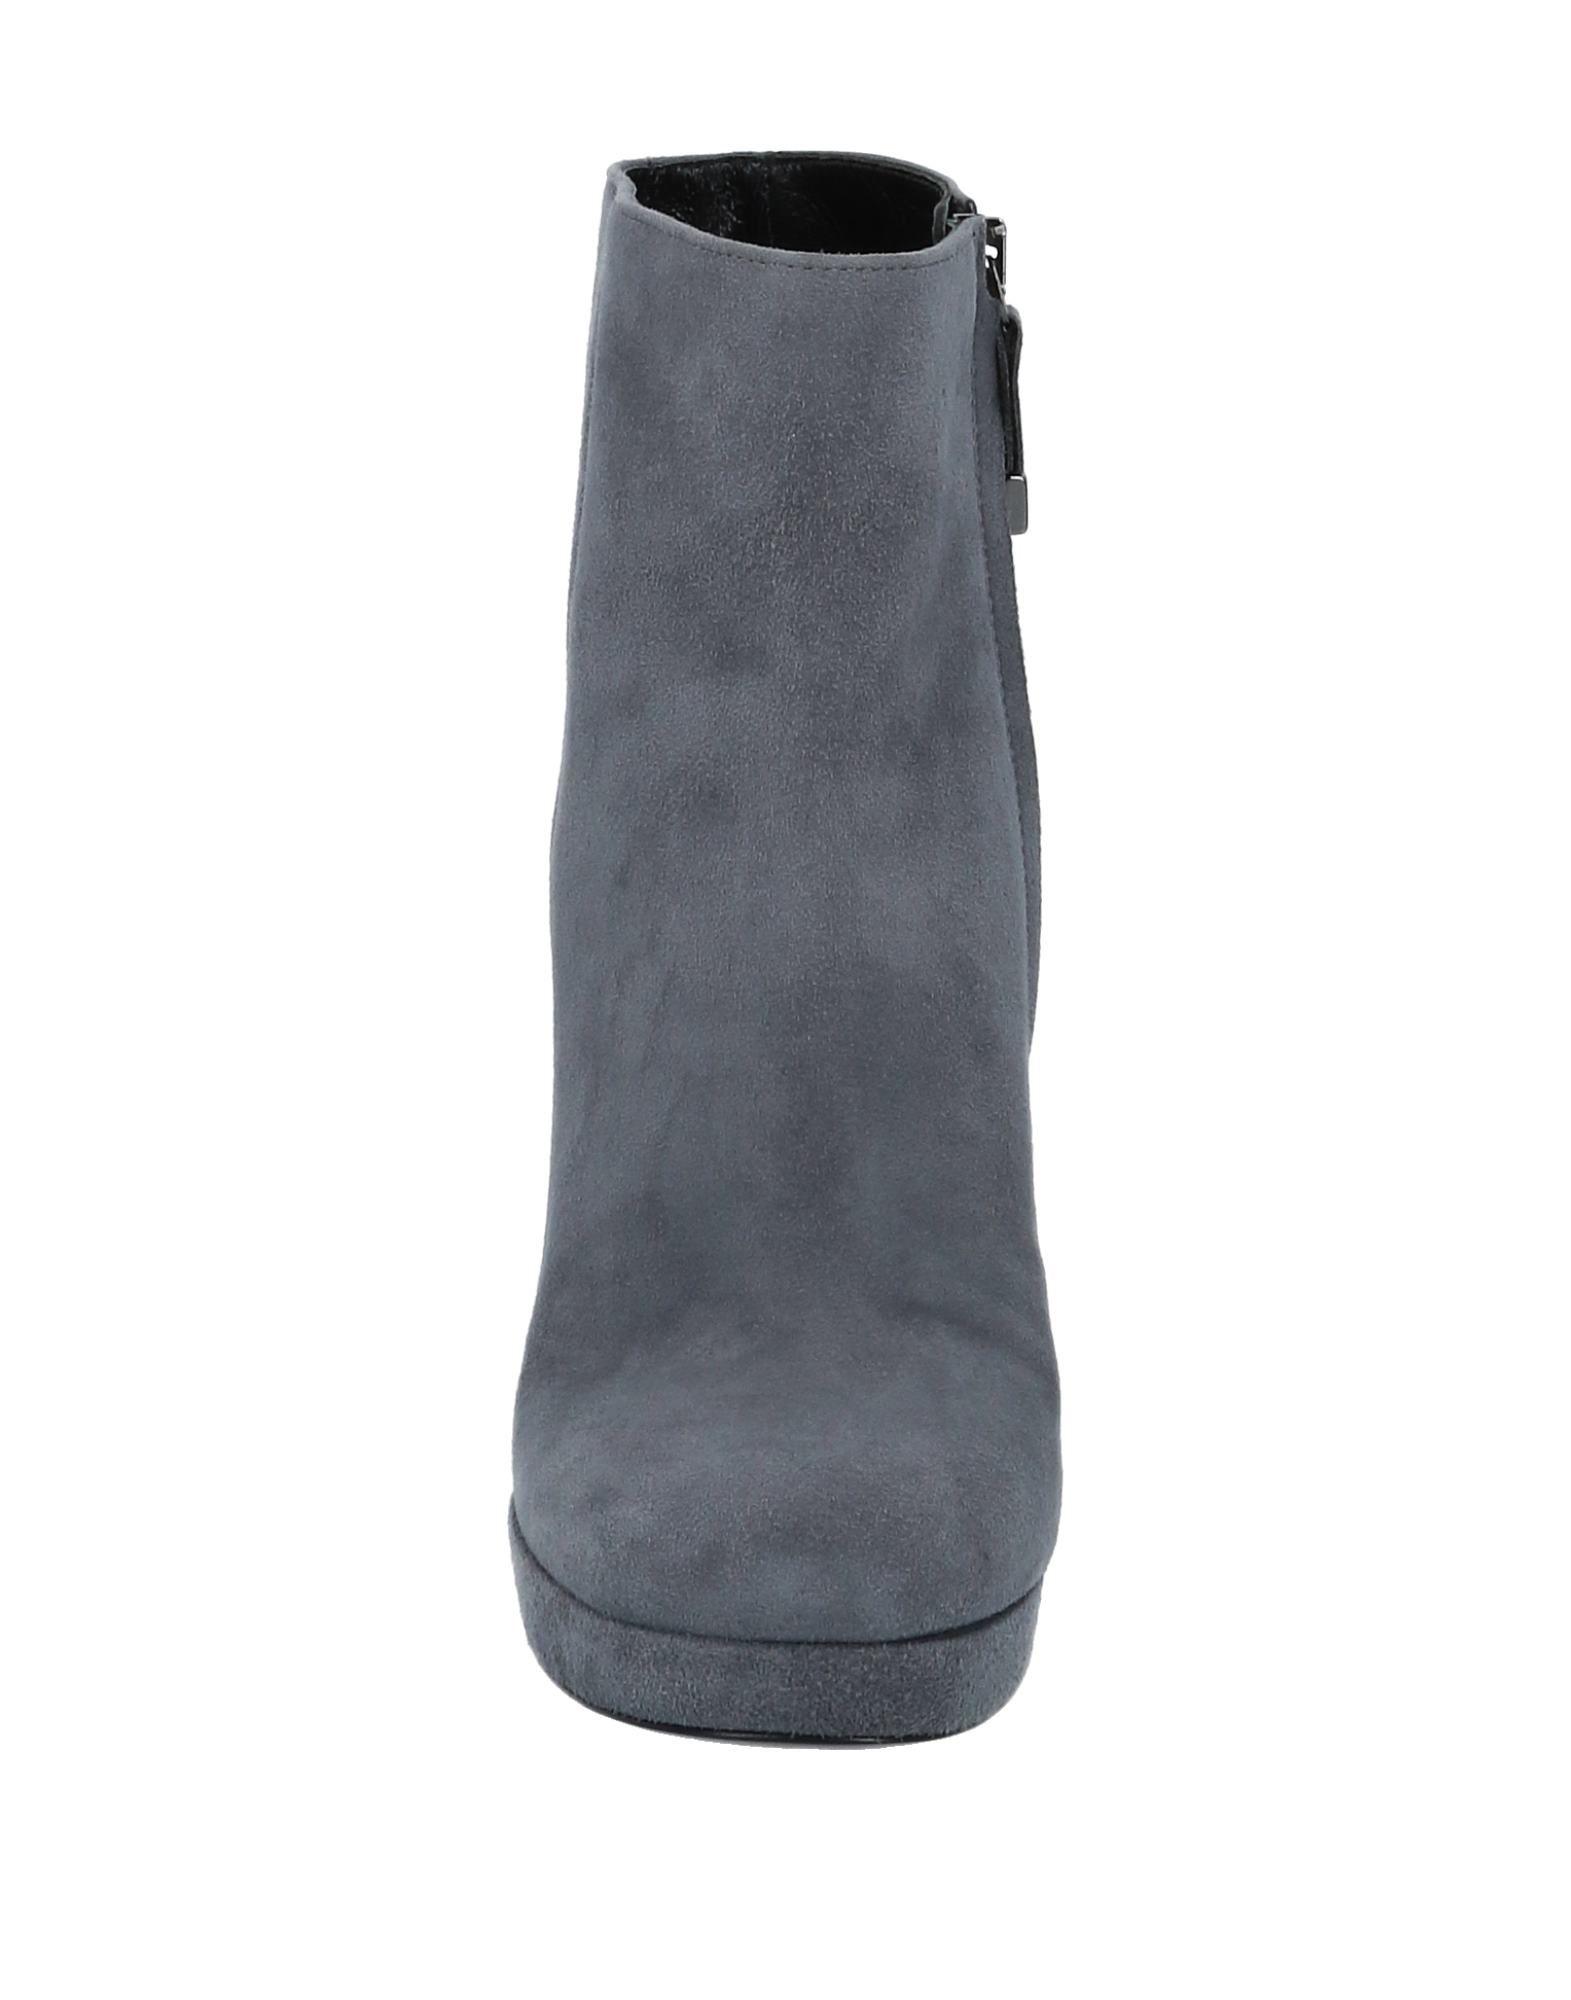 Liviana Conti Stiefelette Damen 11538453FLGut  11538453FLGut Damen aussehende strapazierfähige Schuhe 0e02ad